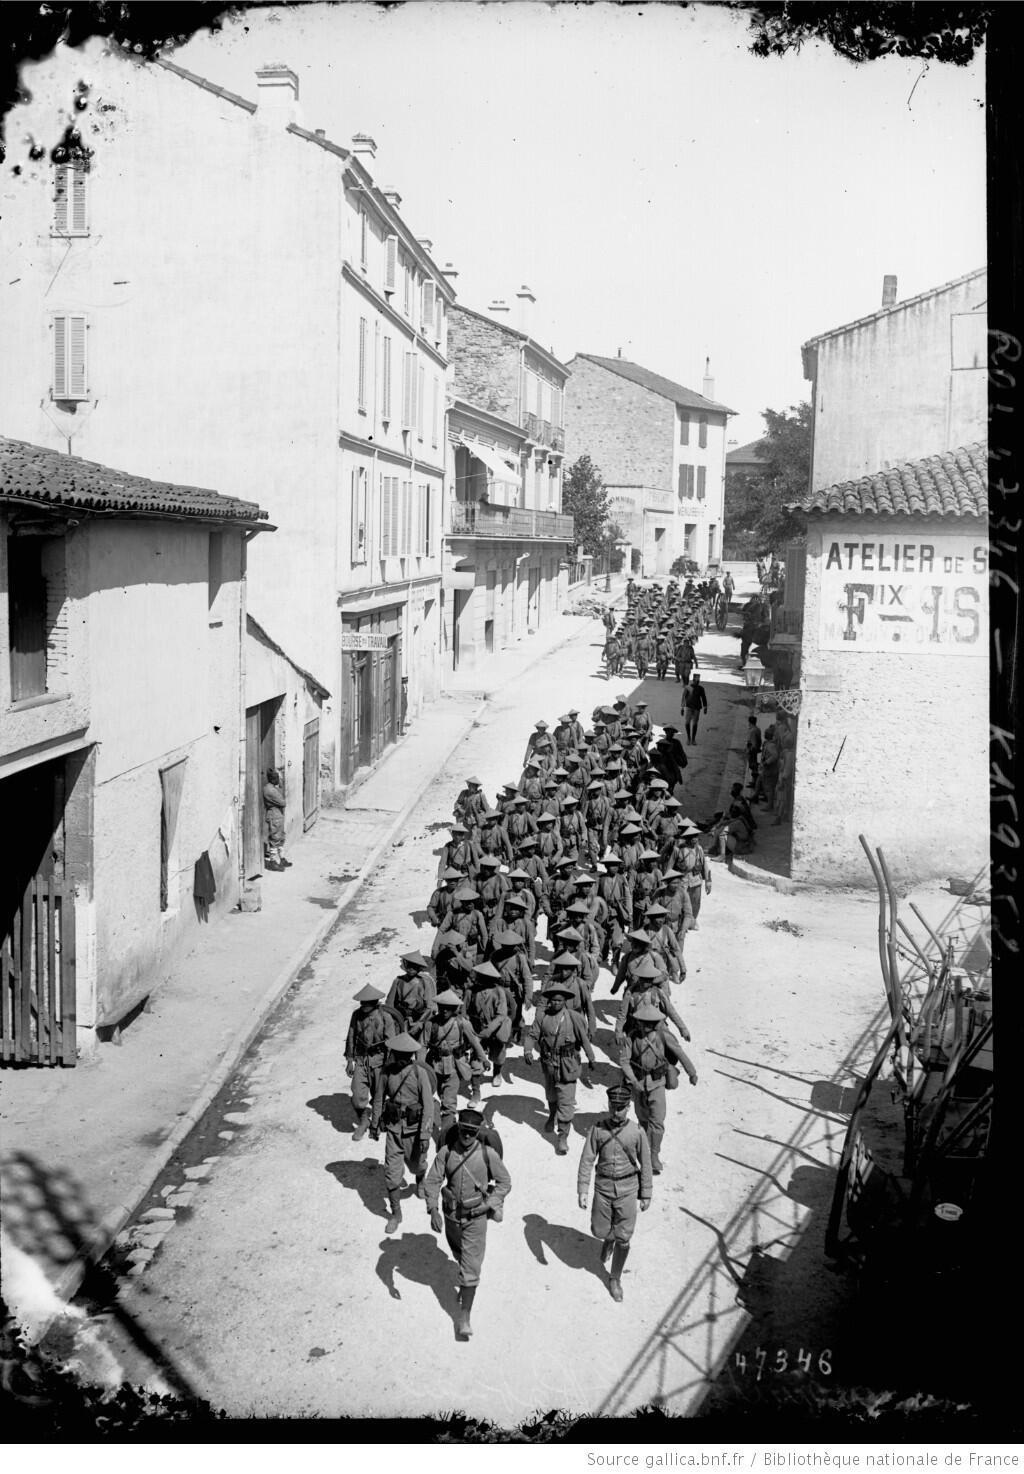 Lính Đông Dương ở Saint-Raphael (miền nam Pháp).